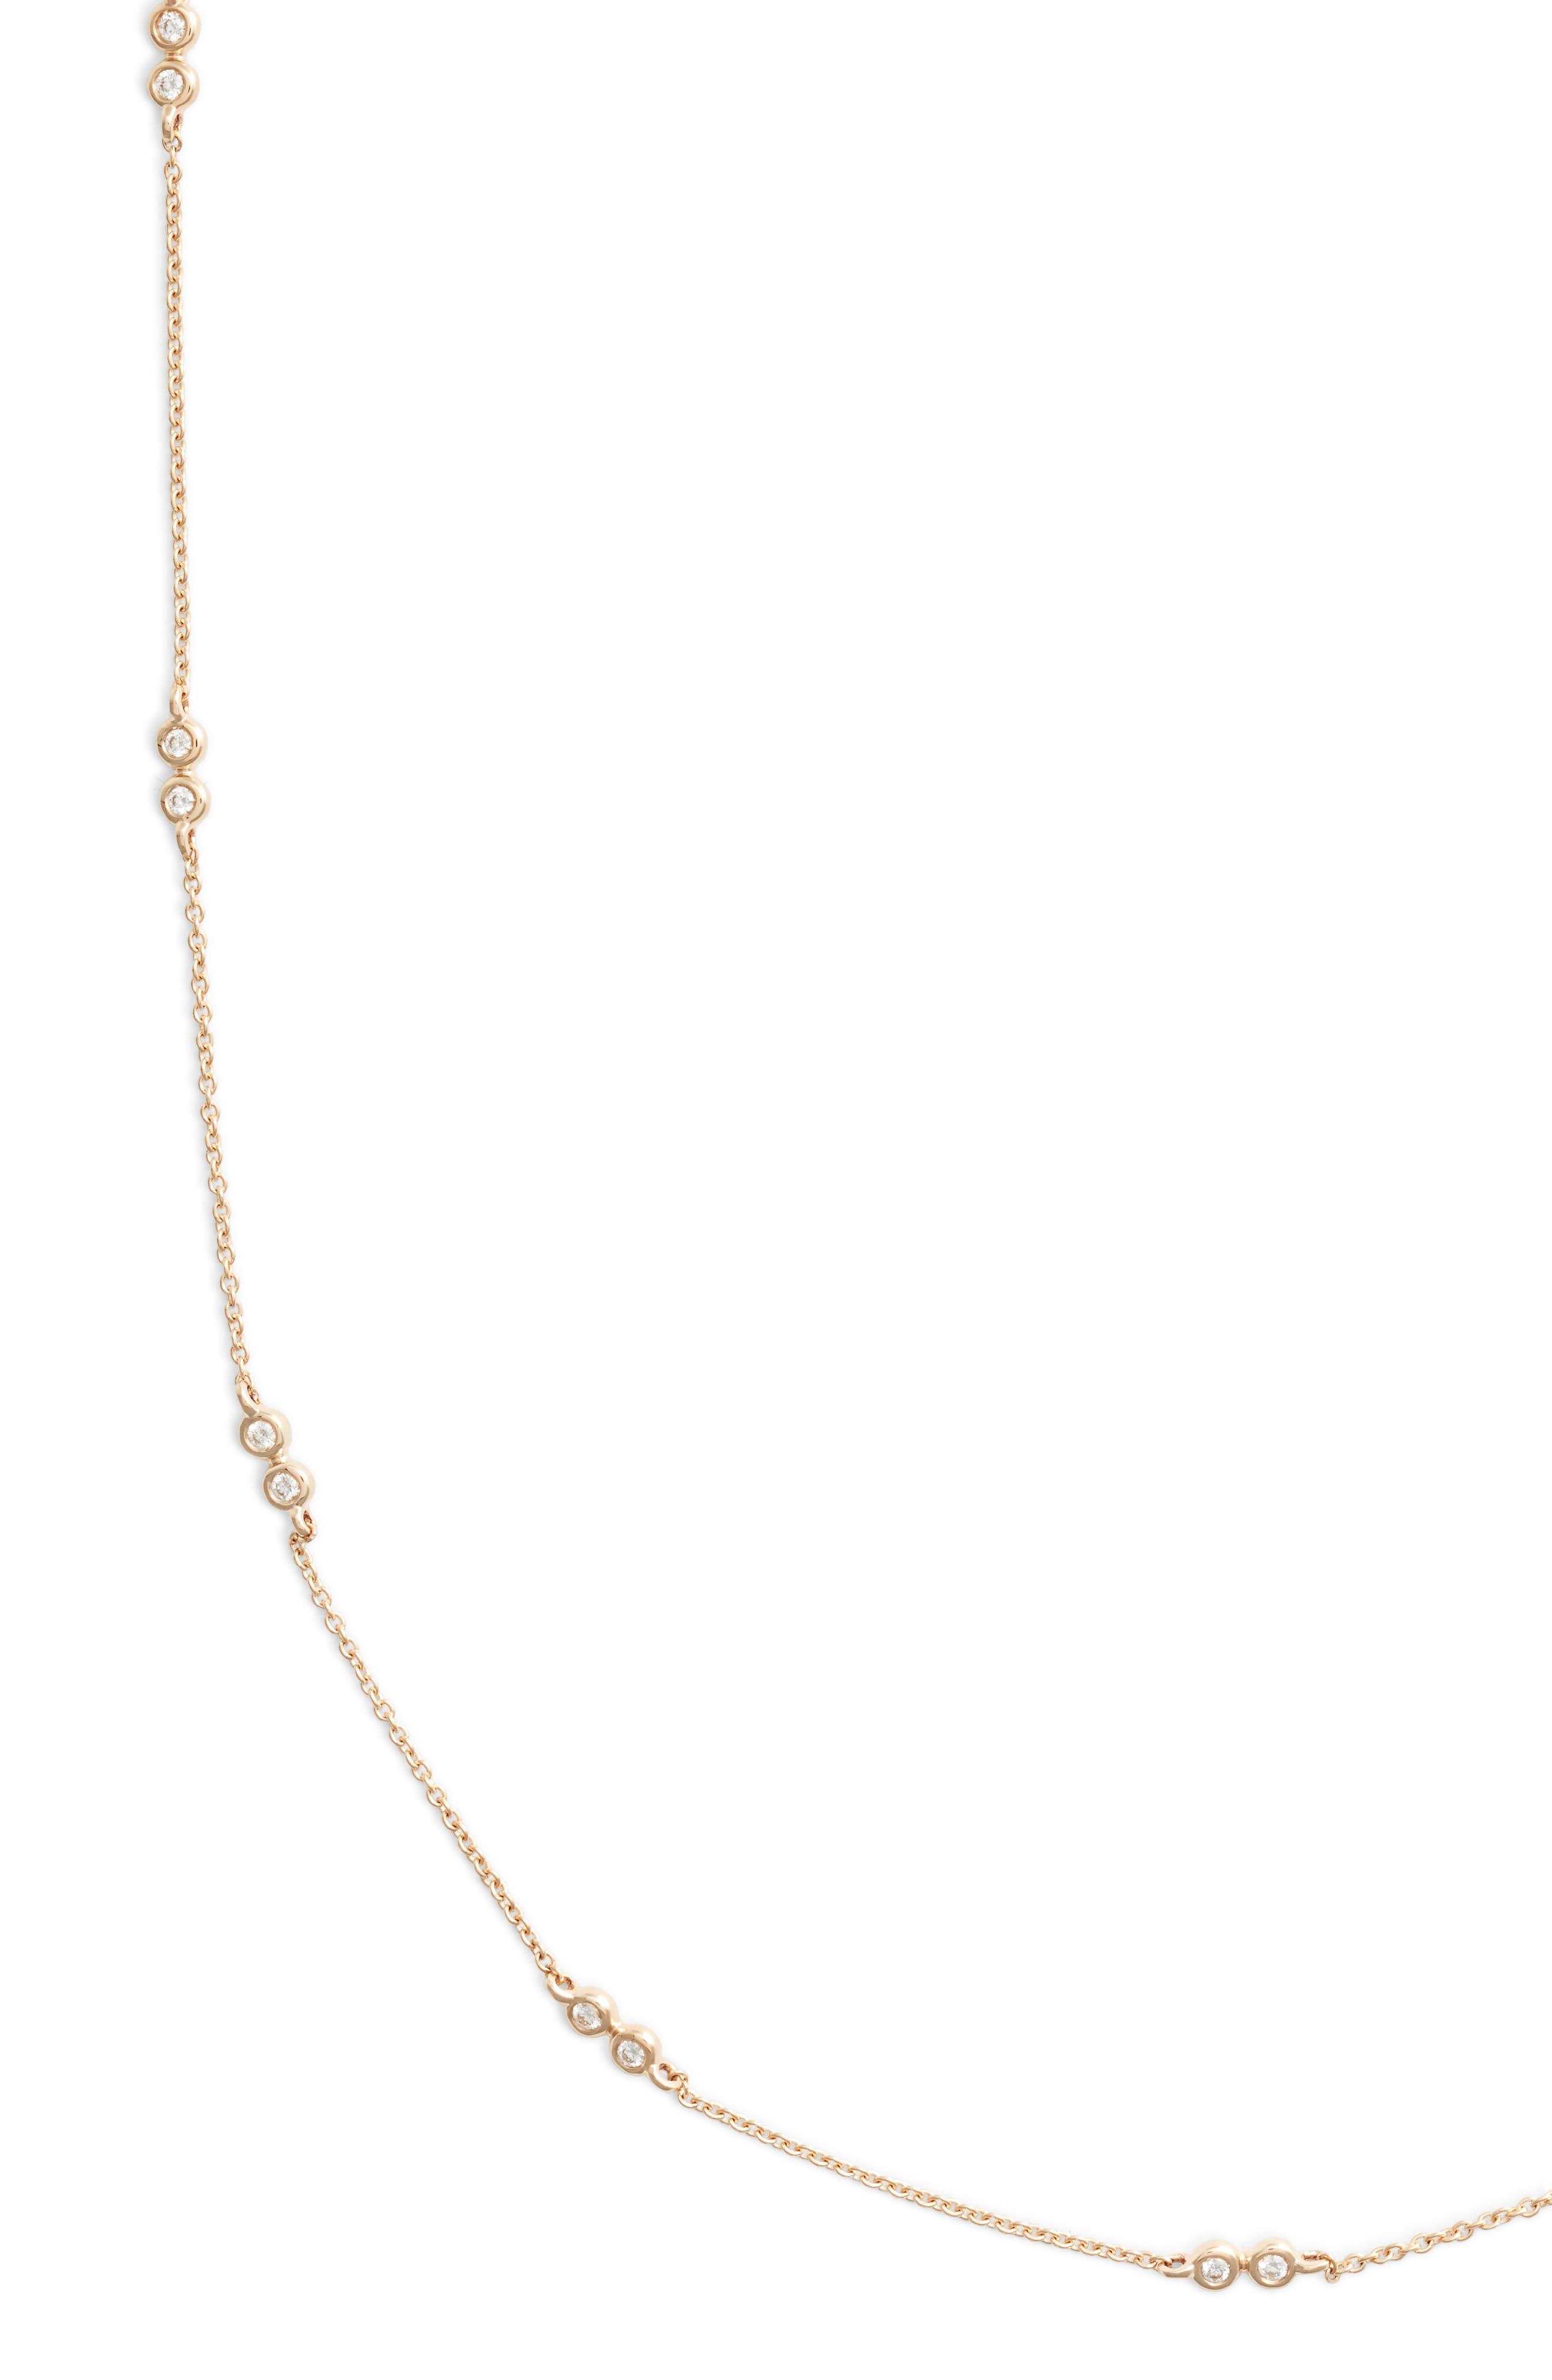 Lulu Jack Diamond Station Necklace,                             Main thumbnail 1, color,                             Yellow Gold